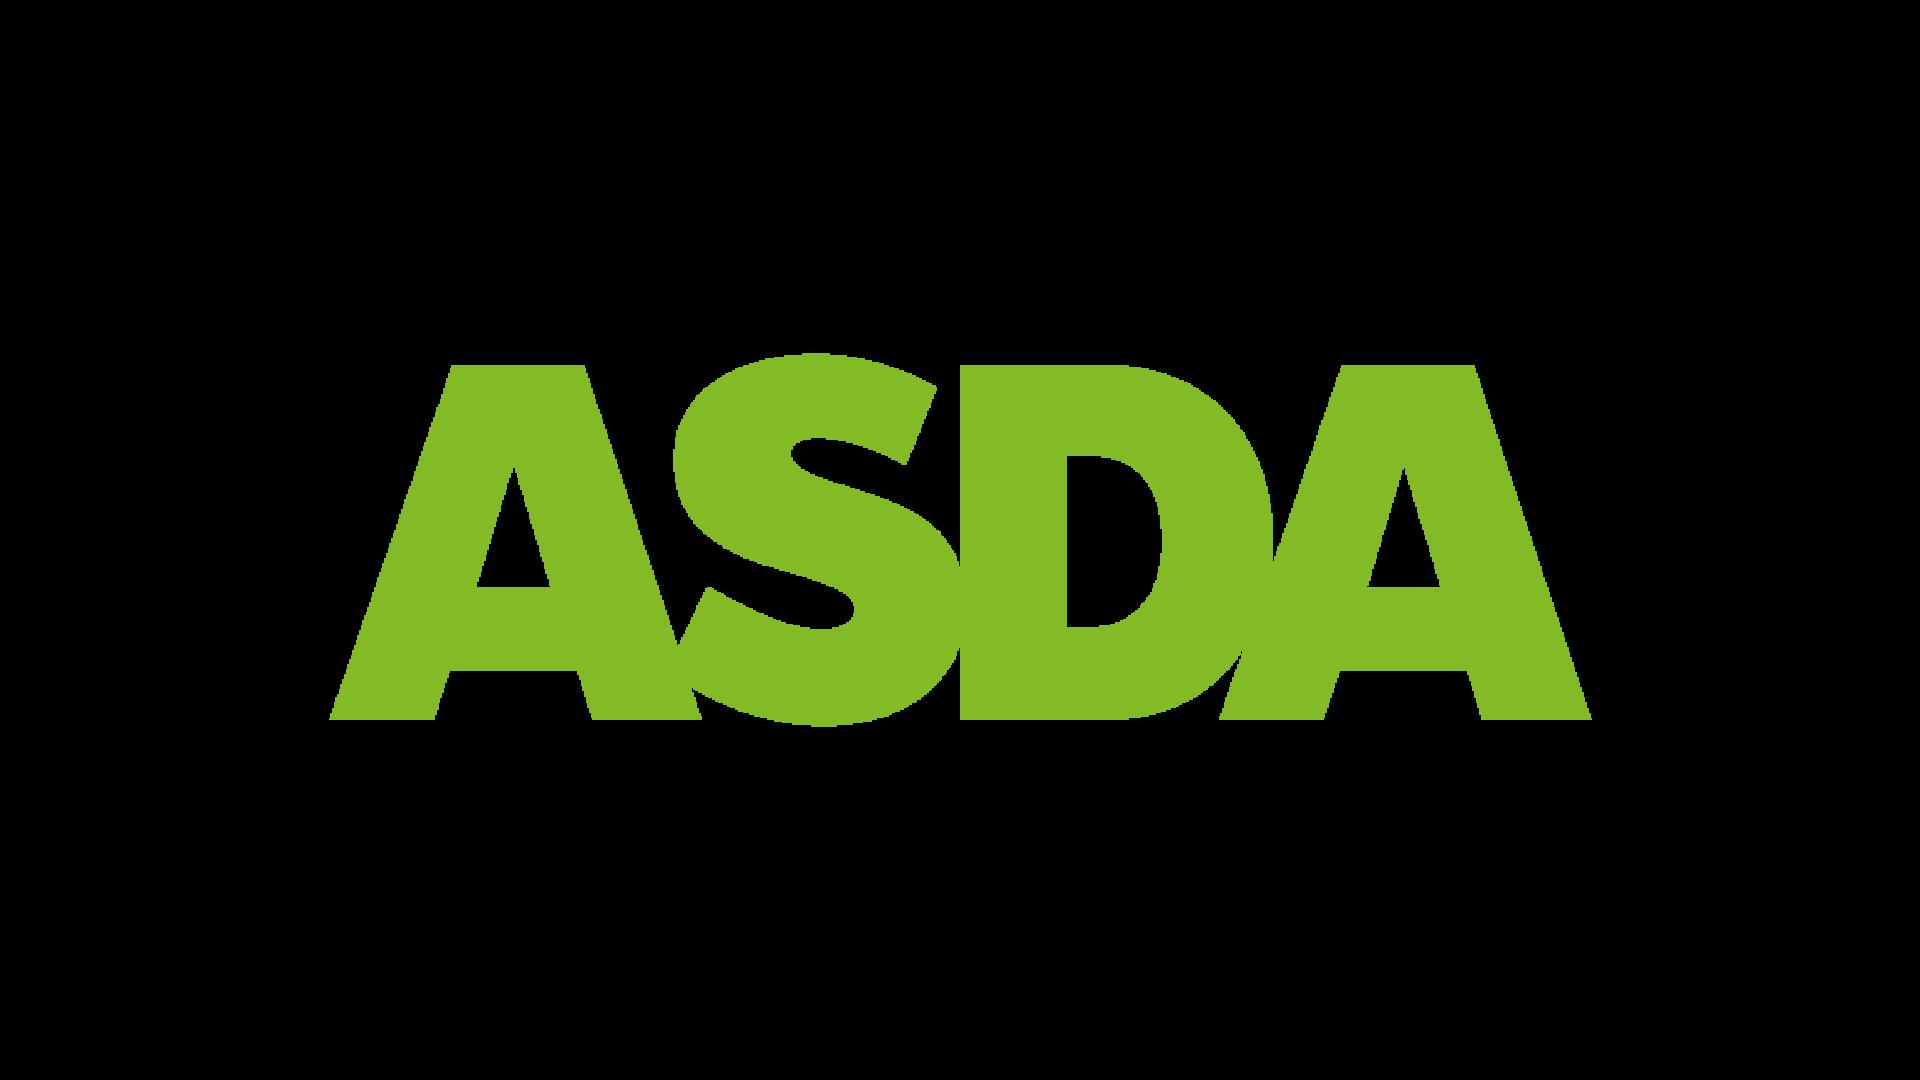 CADS Client Asda